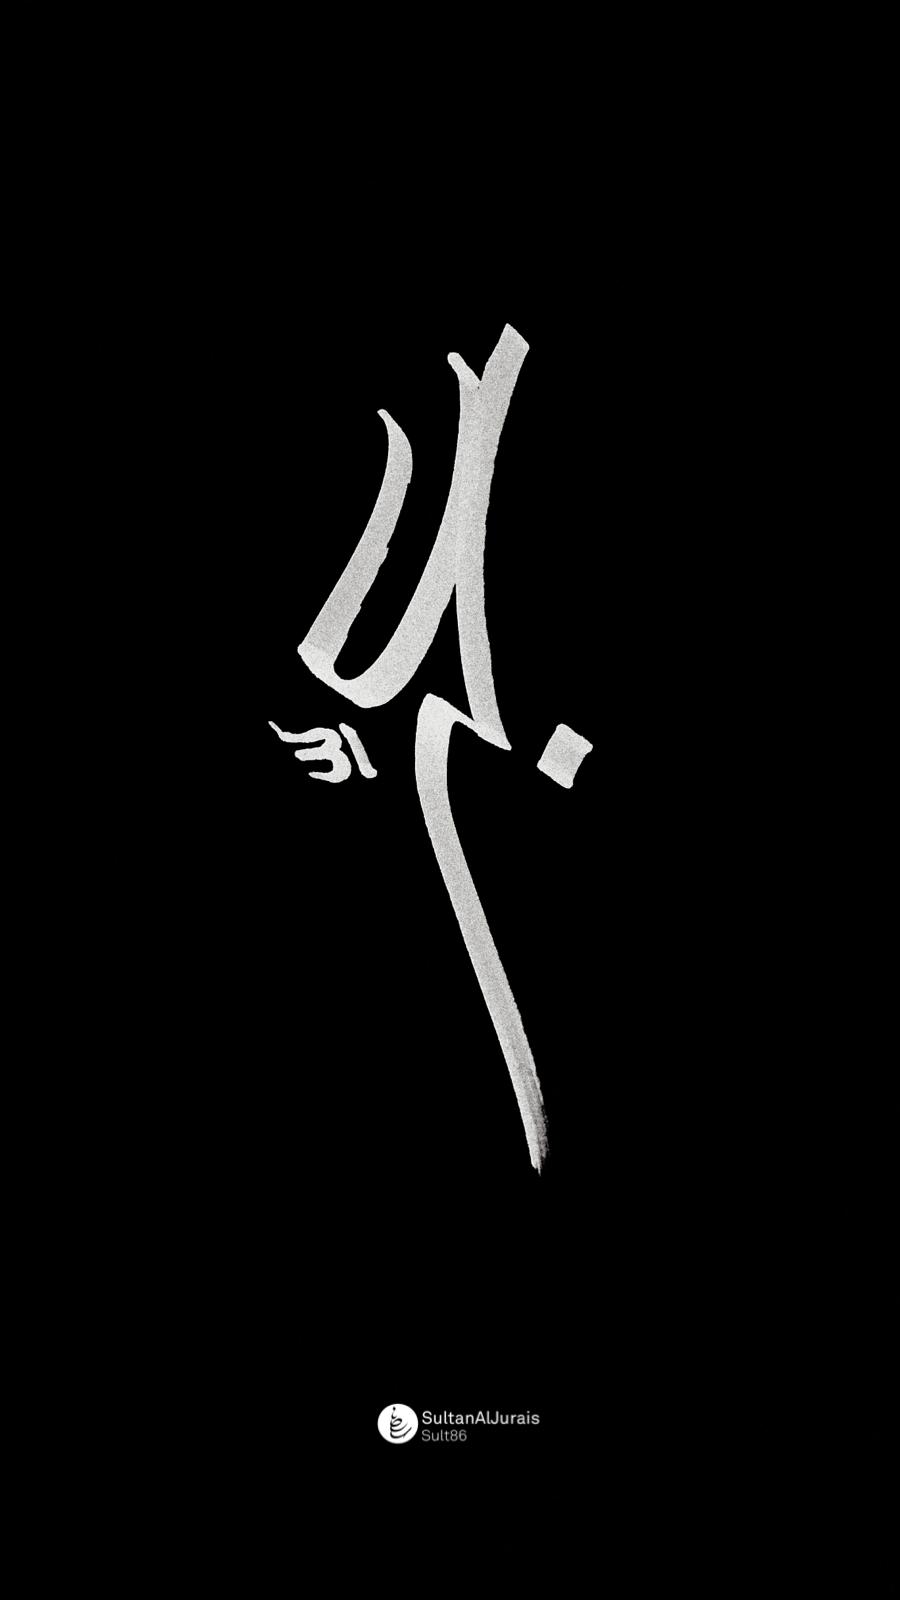 Arabic Calligraphy خط خط عربي حرف عربي Arabic Calligraphy خط حر فن Hand Calligraphy Calligraphy Creative Bookshelves